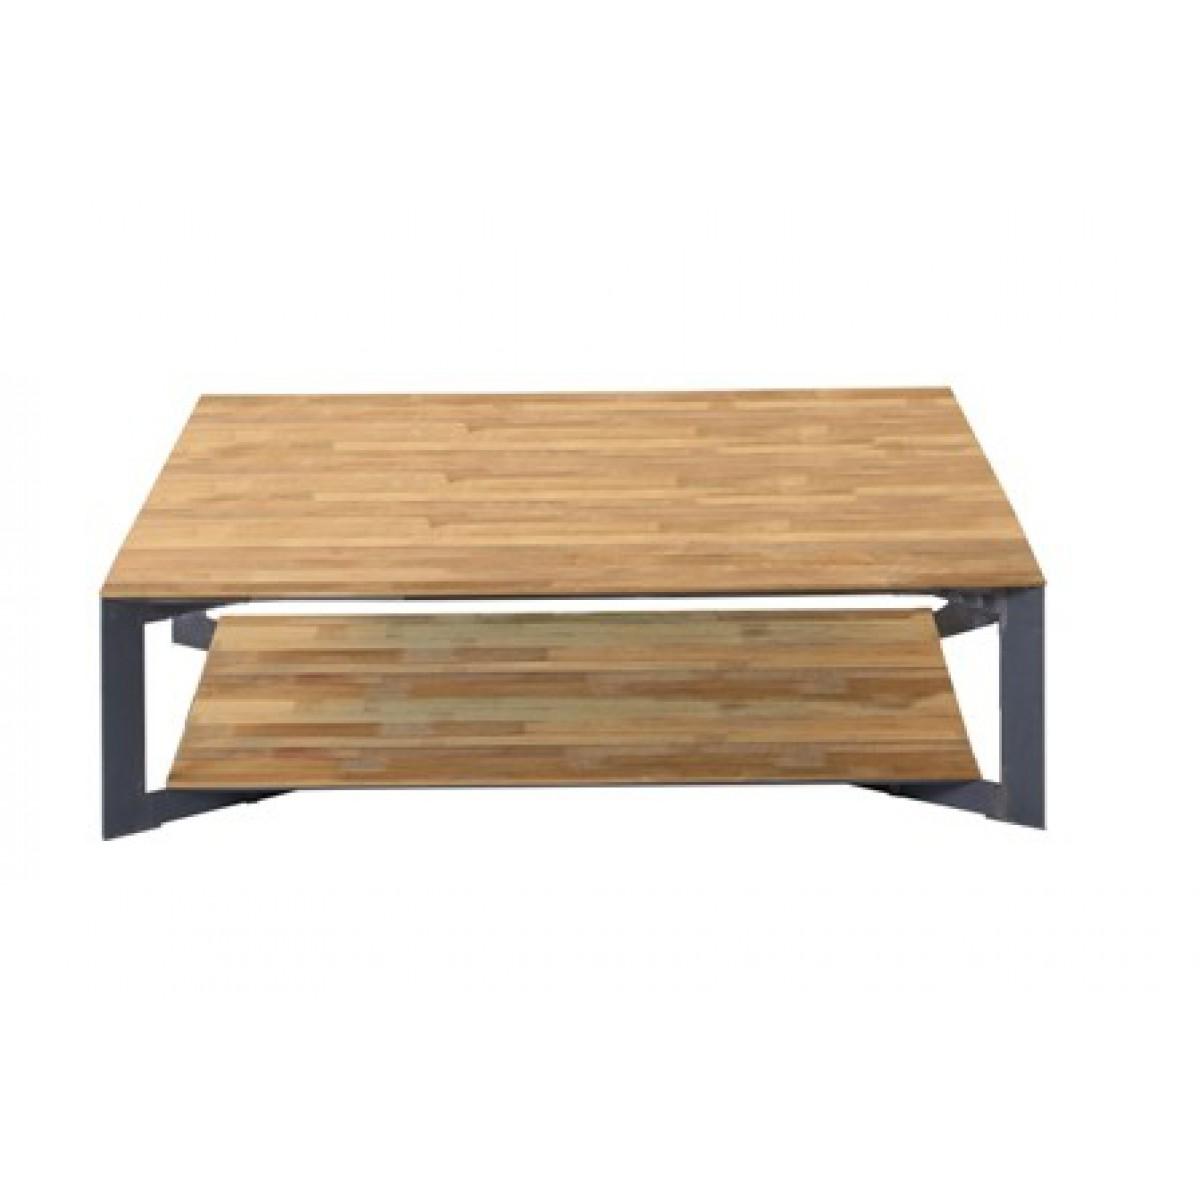 pandora couchtisch 100x100 cm i live design preisg nstig online moebel kaufen. Black Bedroom Furniture Sets. Home Design Ideas